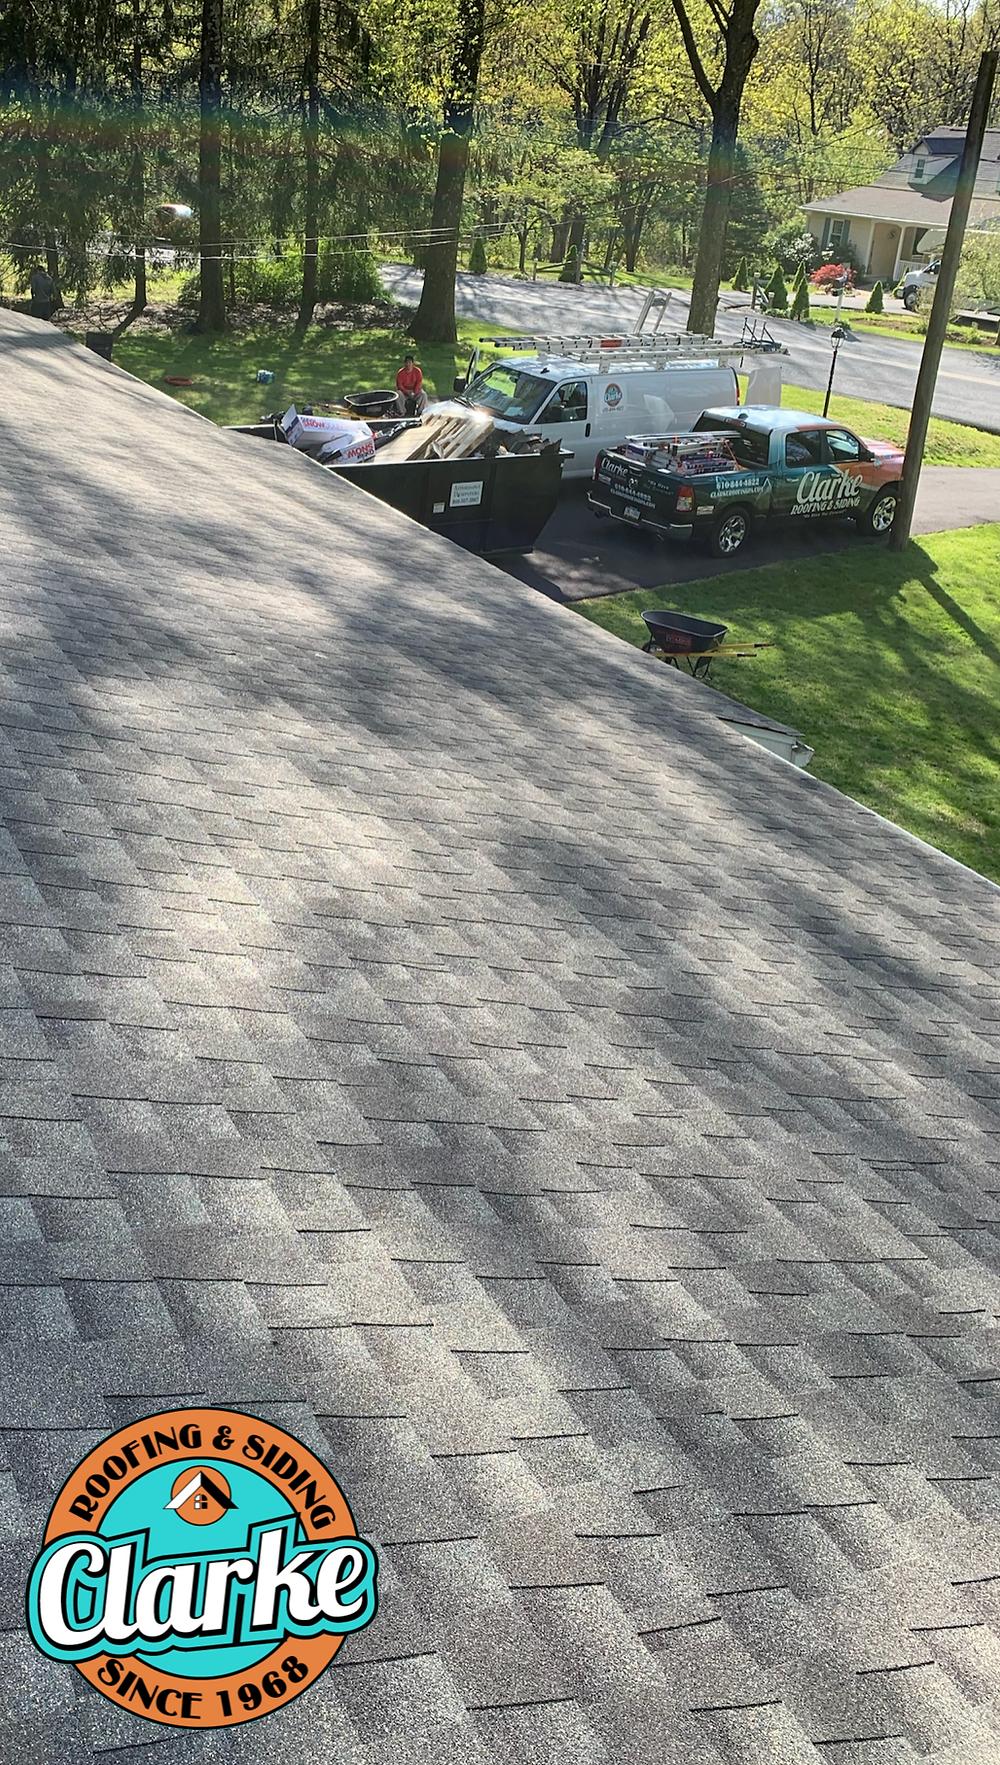 Roofer in Pennylvania, Bethlehem Roofer, Allentown Roofer, Hellertown Roofer, Coopersburg Roofer, Emmaus Roofer, Zionsville Roofer, Bucks County Roofer, Northampton County Roofer, Lehigh County Roofer, Roofer near me, Top roofer Pennsylvania, Best Roofer Near me, GAF, GAF Shingles, Timberline HD, Shingles, Aspahlt Shingles, Should I replace my roof? When should i get a new roof? Pennsylvania Gutter Company, Best Roofer, New Jersey Roofer, Bergen County Roofer, Hellertown Roofing, Allentown Roofing, Bethlehem Roofing, Siding Hellertown, Eastern PA Roofer